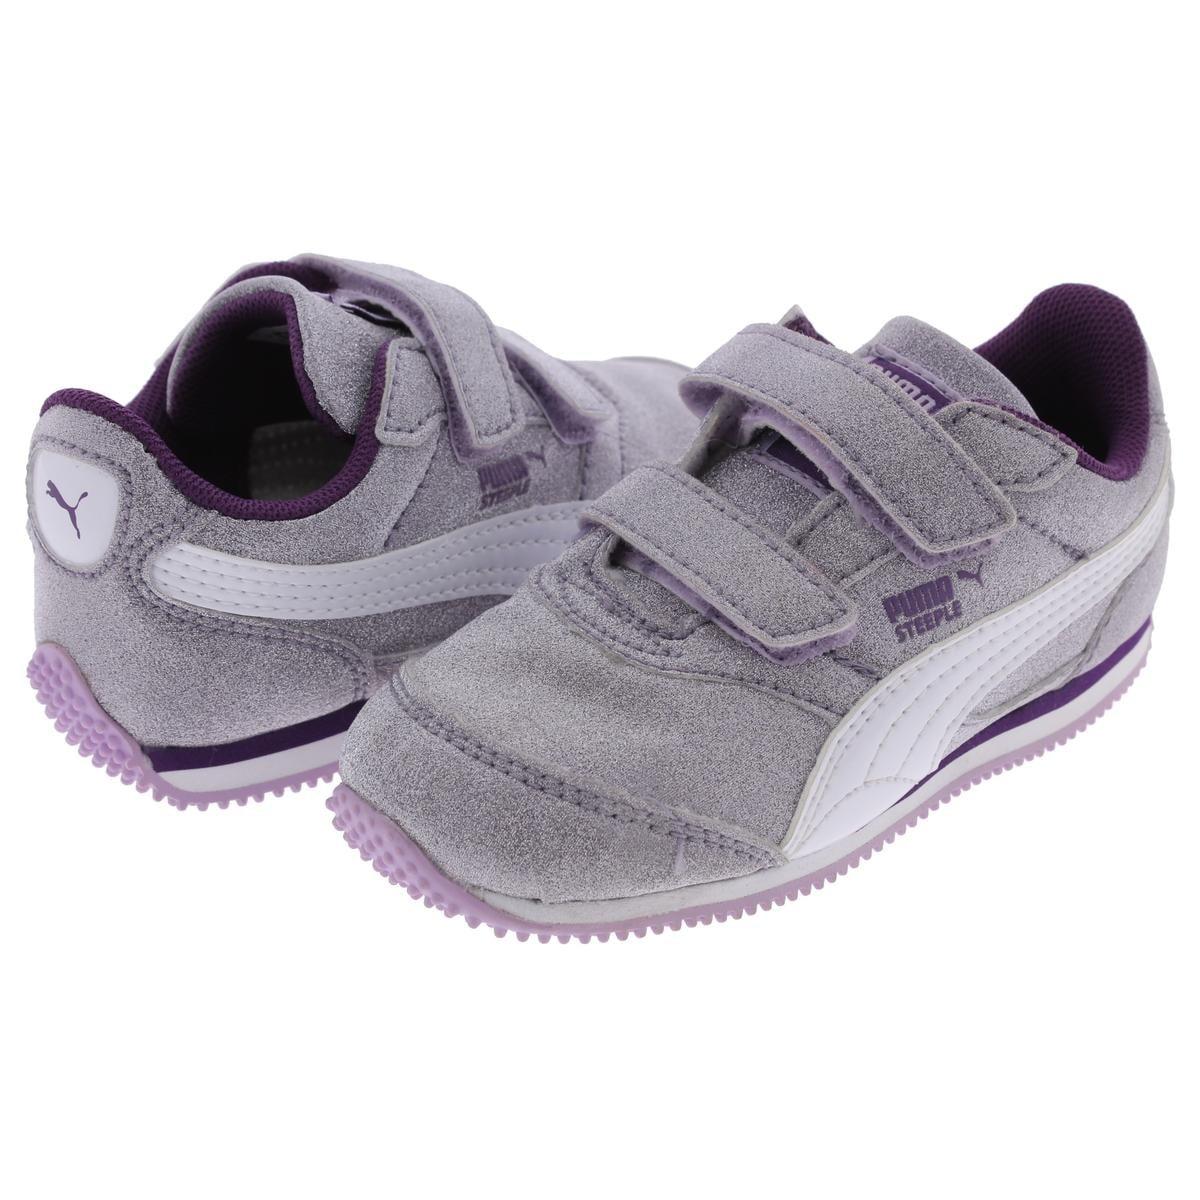 Shop Puma Steeple Glitz Casual Shoes Glitter Toddler Girls - 7 medium (b 4e2ee42e9